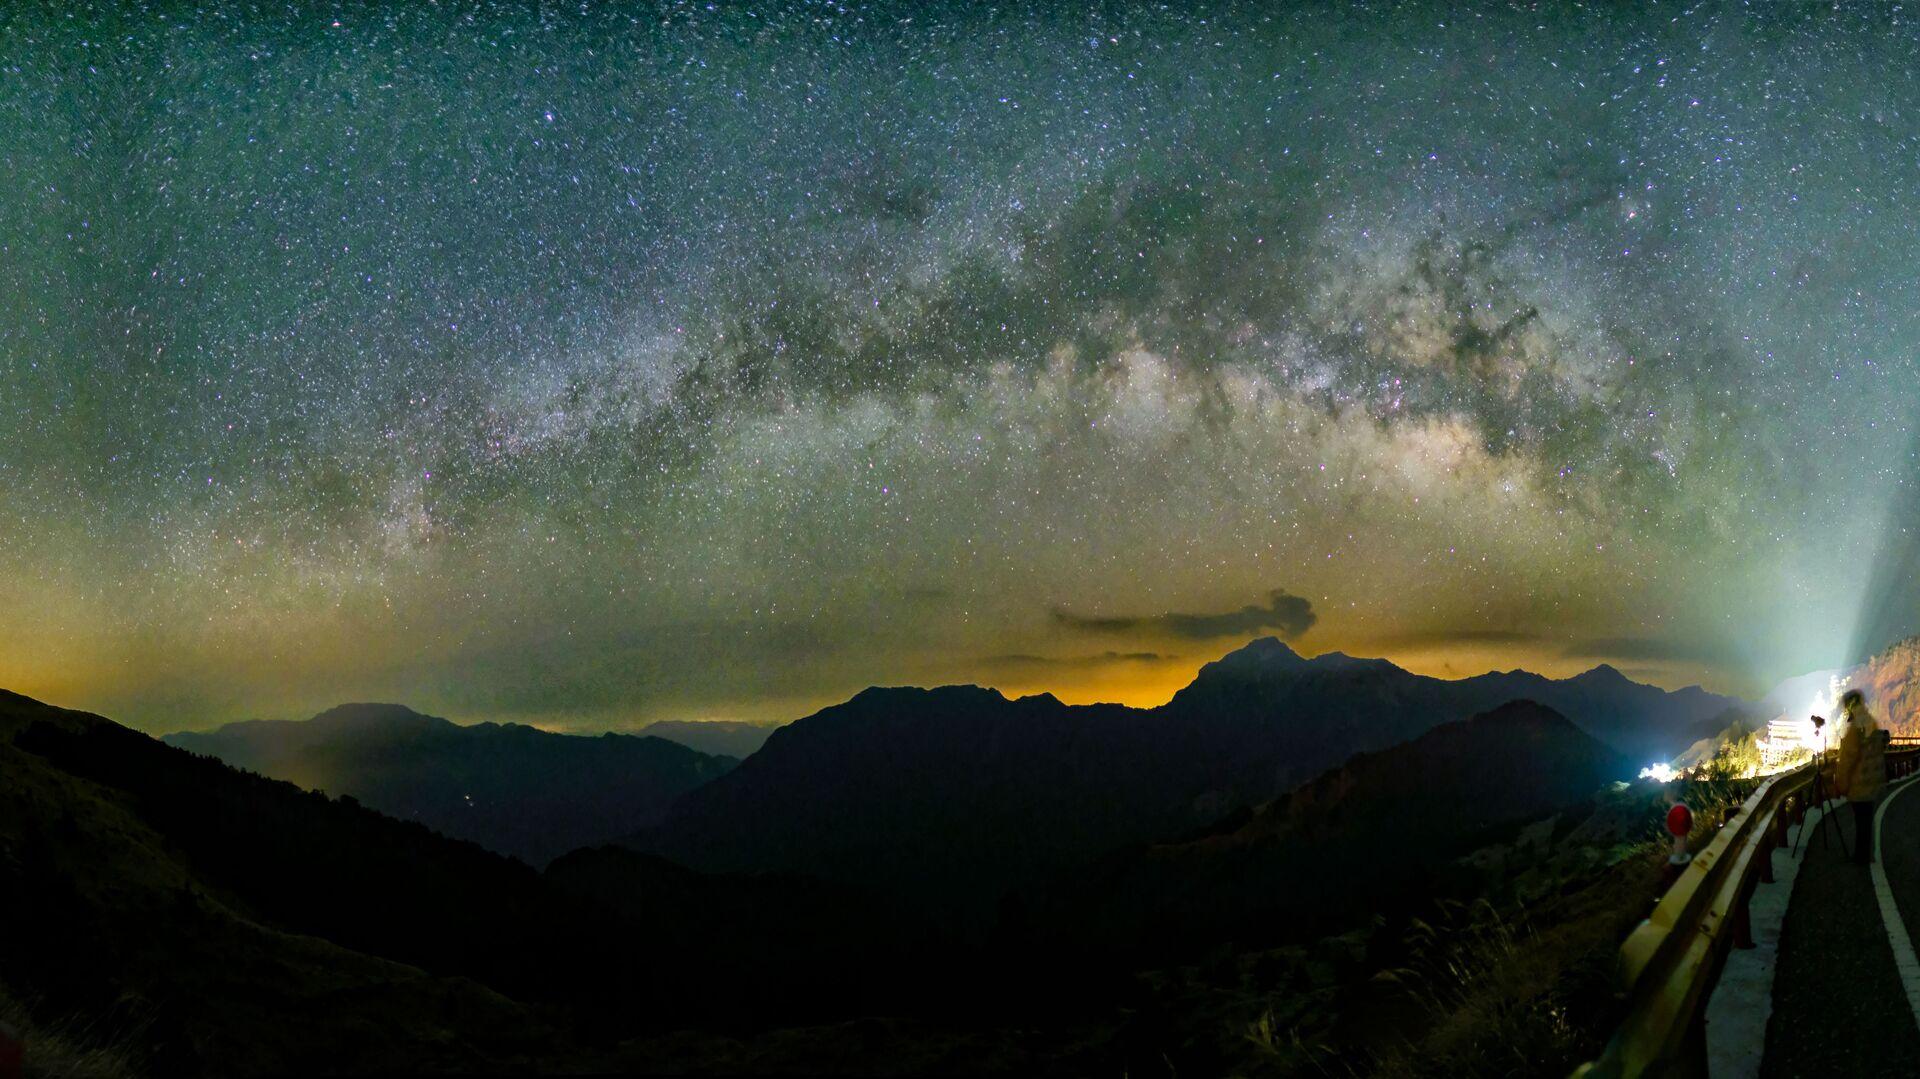 Млечный путь с горы Хехуан в Тайване - Sputnik Česká republika, 1920, 30.05.2021